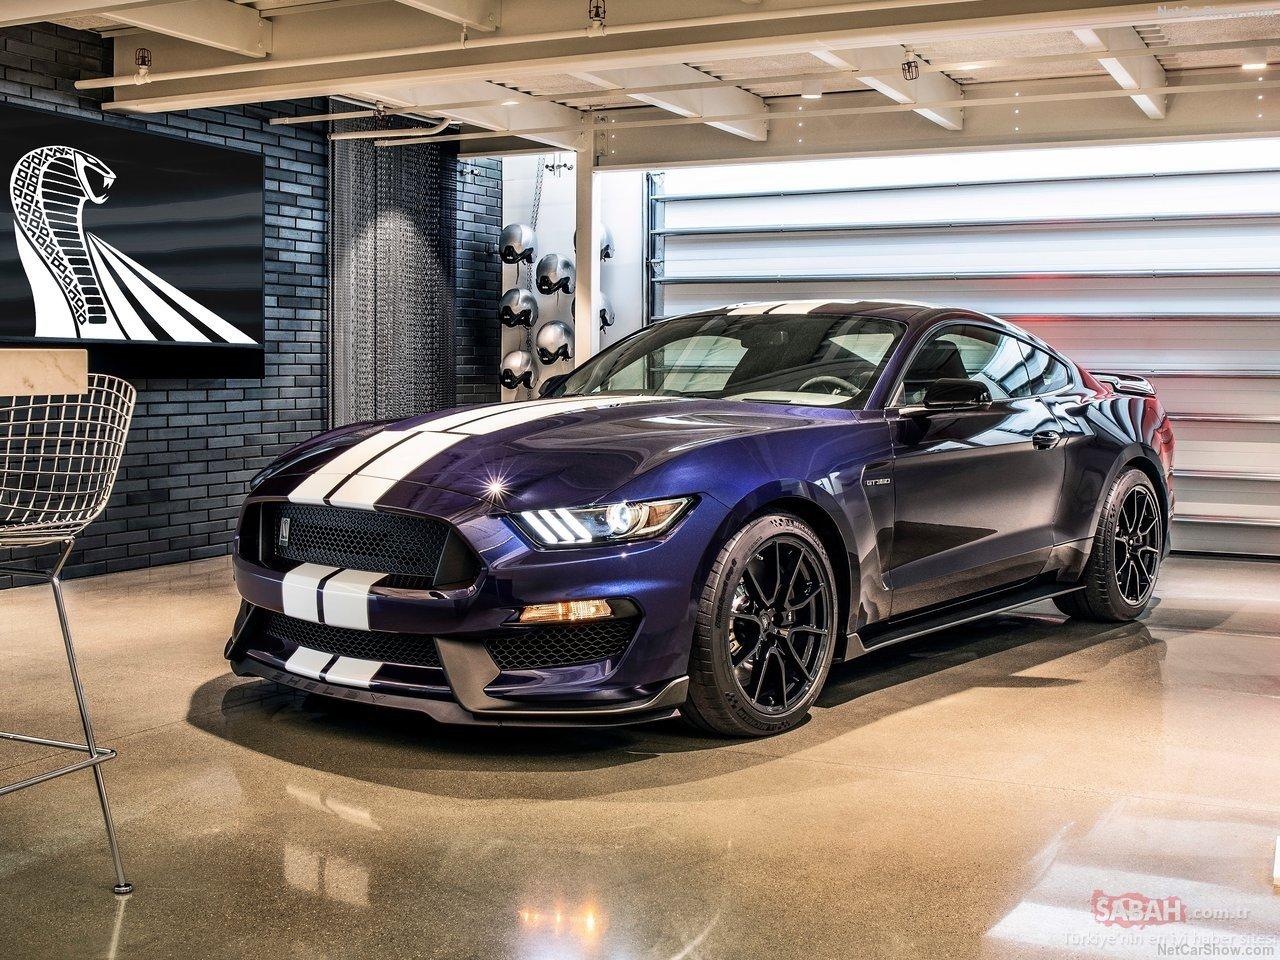 Ford Com Mustang >> 2019 Ford Mustang Shelby Gt350 Resmen Tanitildi Galeri Otomobil